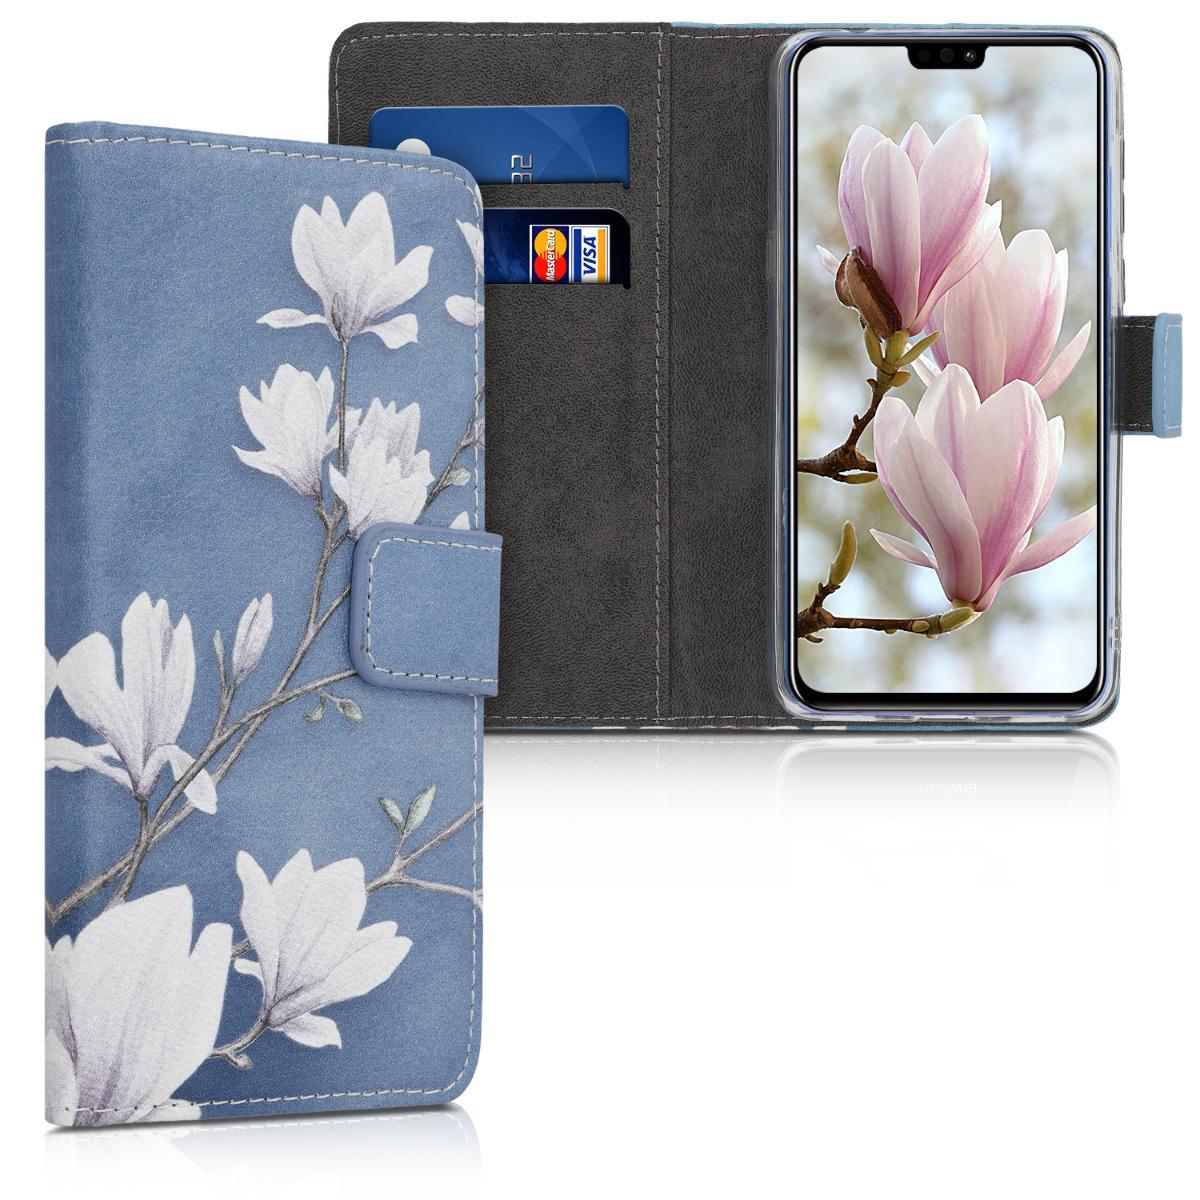 KW Θήκη Πορτοφόλι Huawei Honor 8X - Taupe / White / Blue Grey (48779.02)